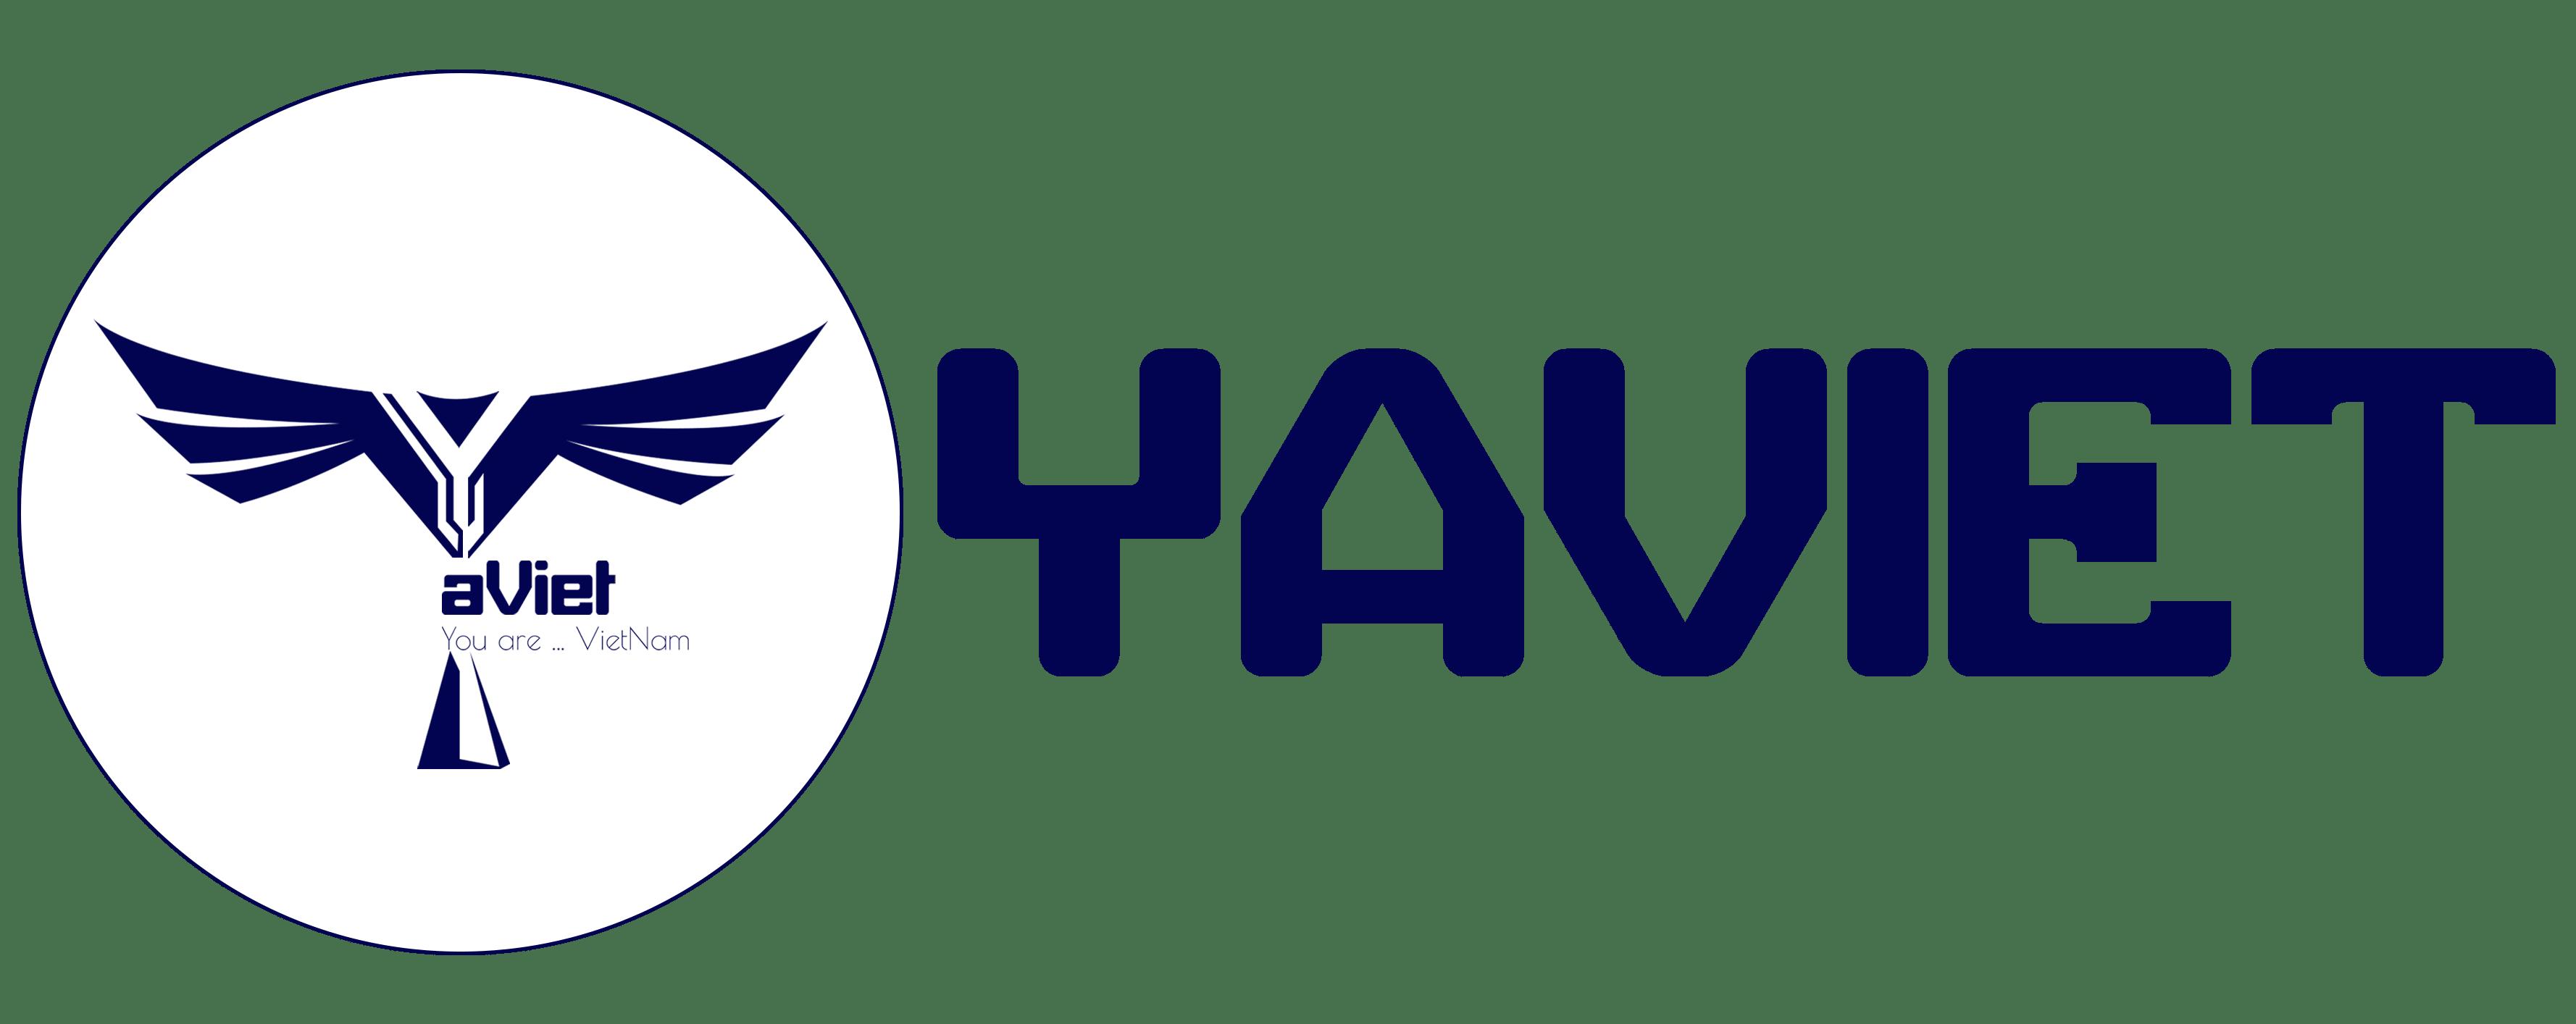 LOGO YAVIET web